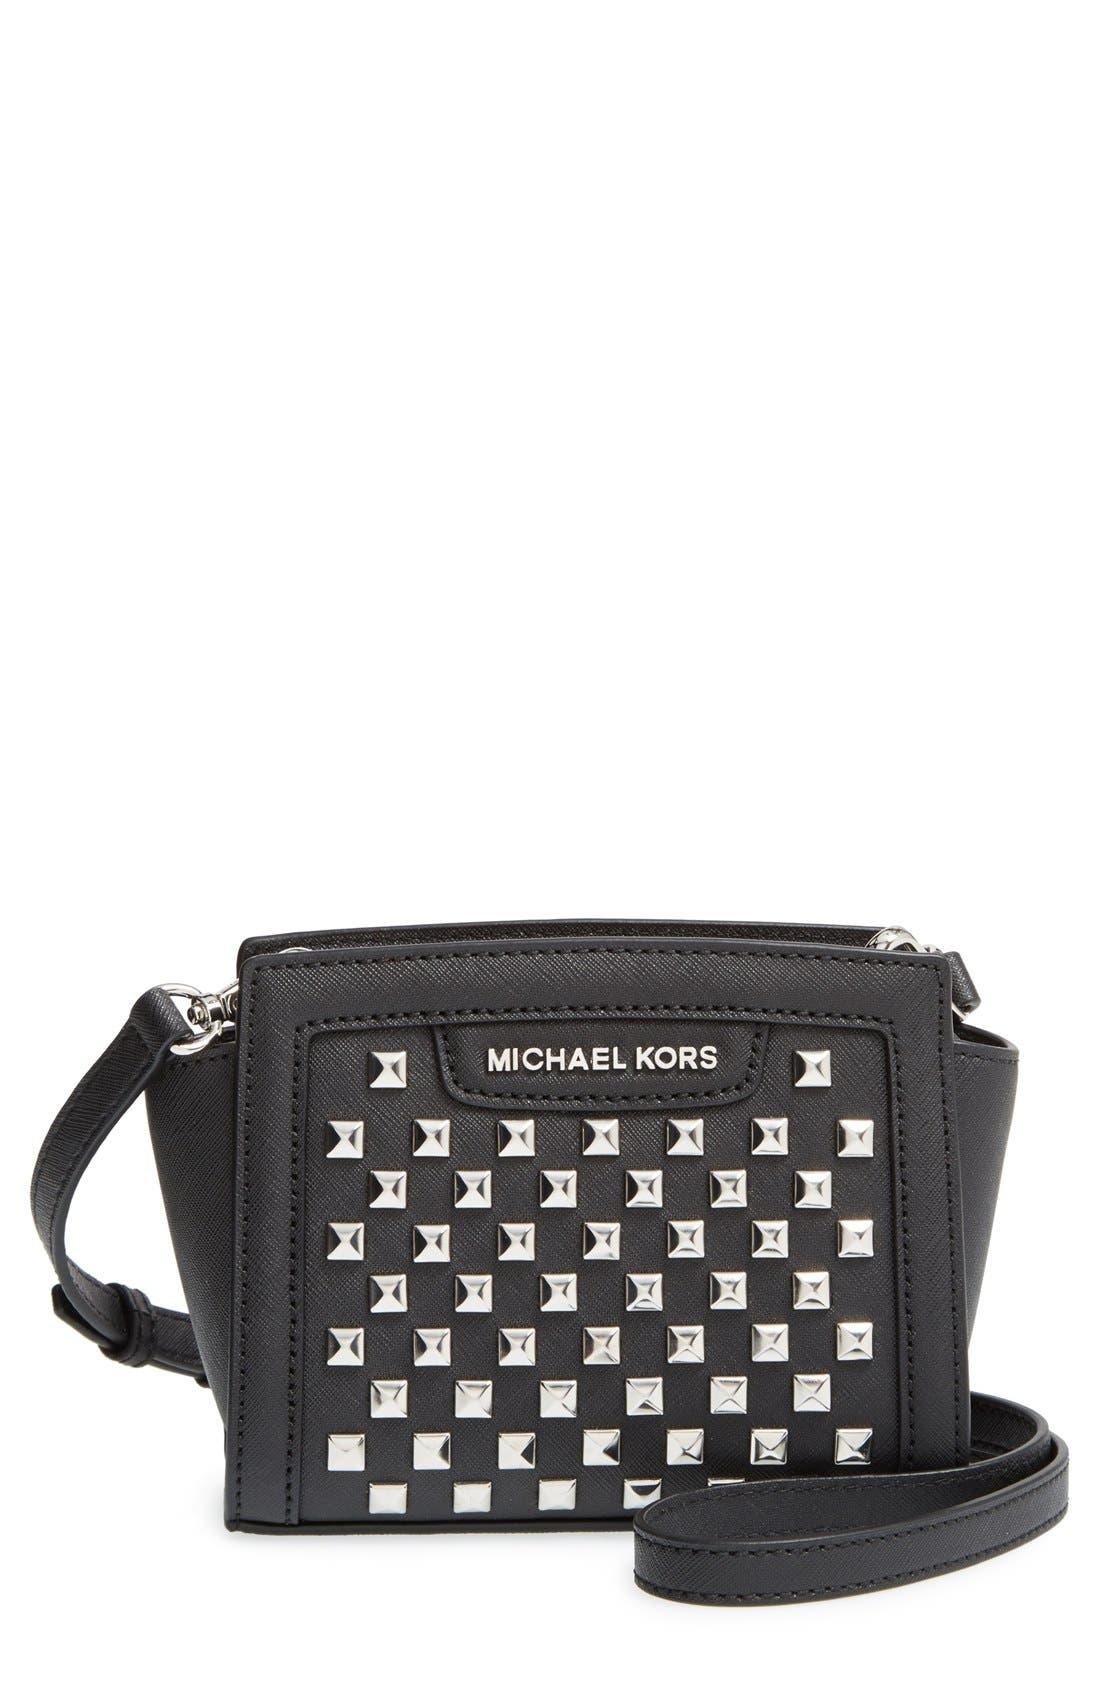 Alternate Image 1 Selected - MICHAEL Michael Kors 'Mini Selma' Studded Saffiano Leather Crossbody Bag